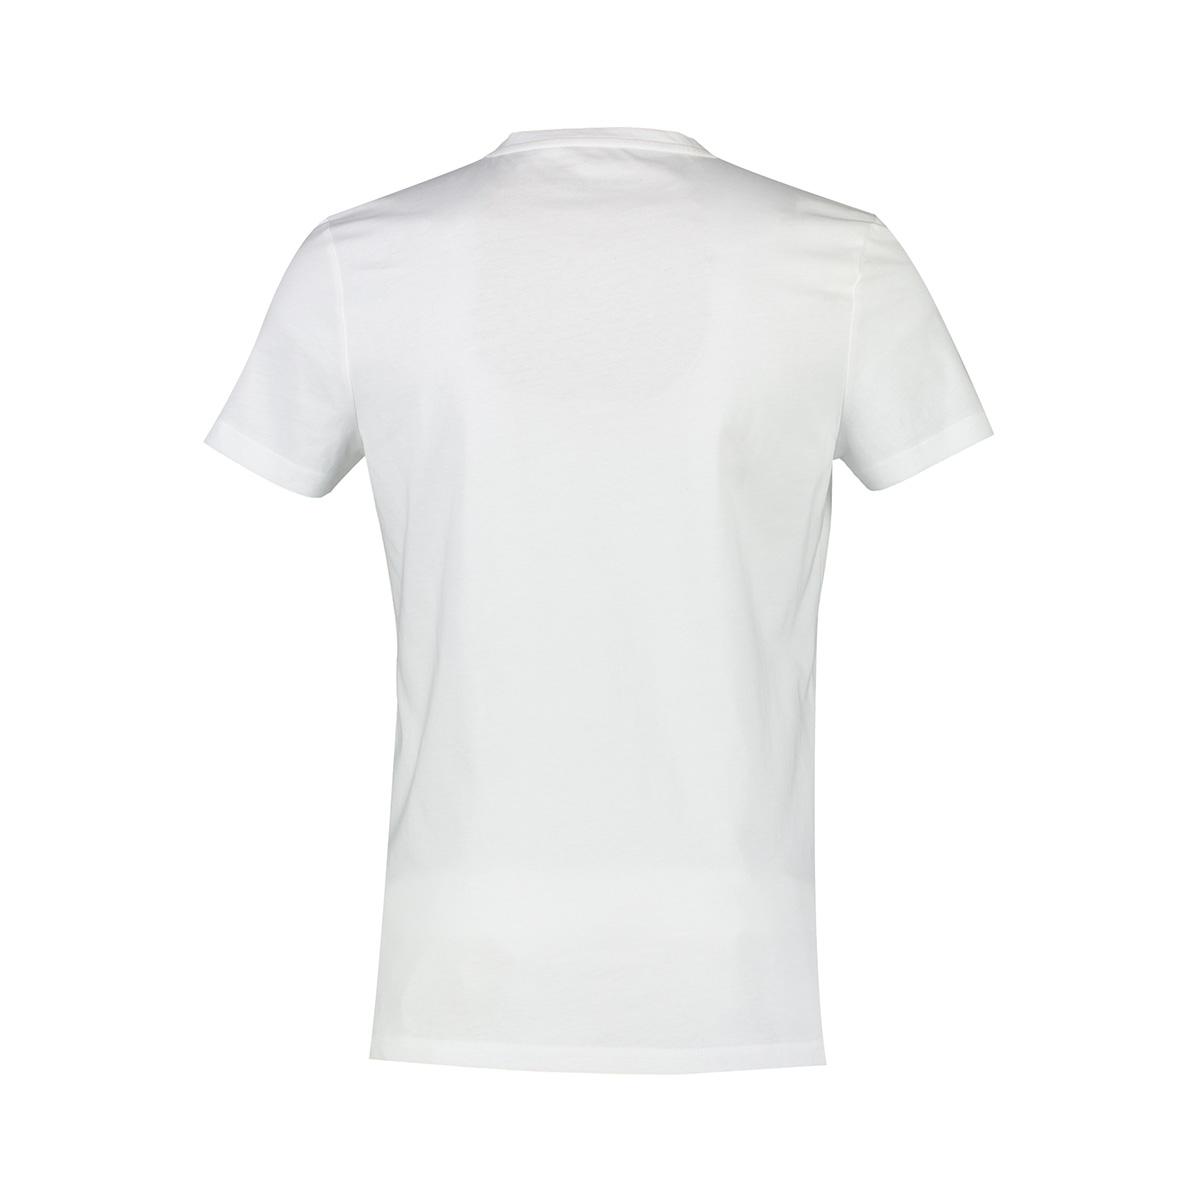 klassiek t shirt 8973003 new in town t-shirt 100